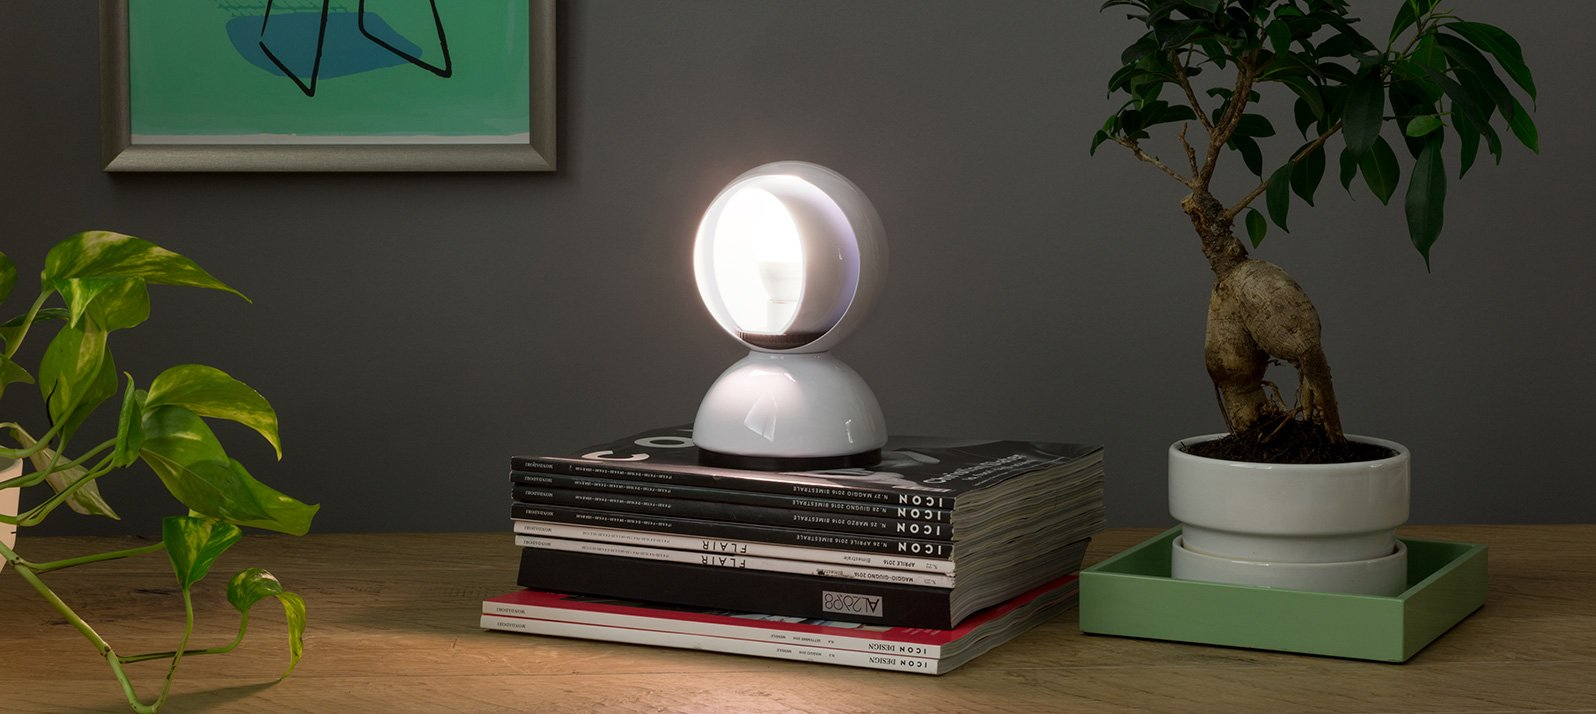 No solo luces, sino objetos luminosos